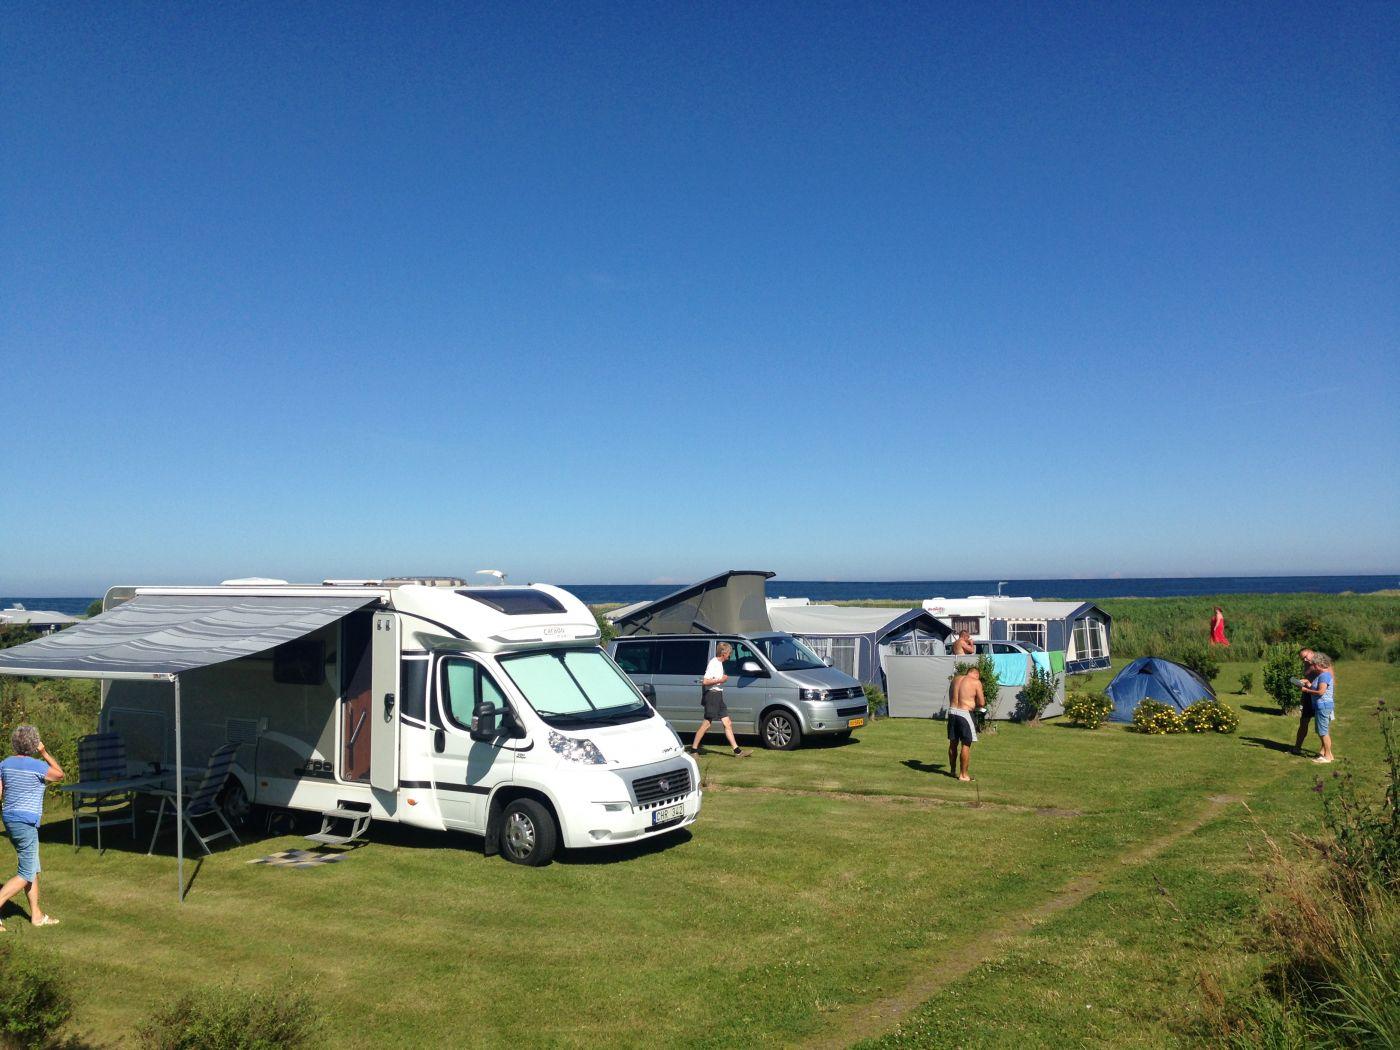 Hals Strand Camping overnatning med campingvogn & telt